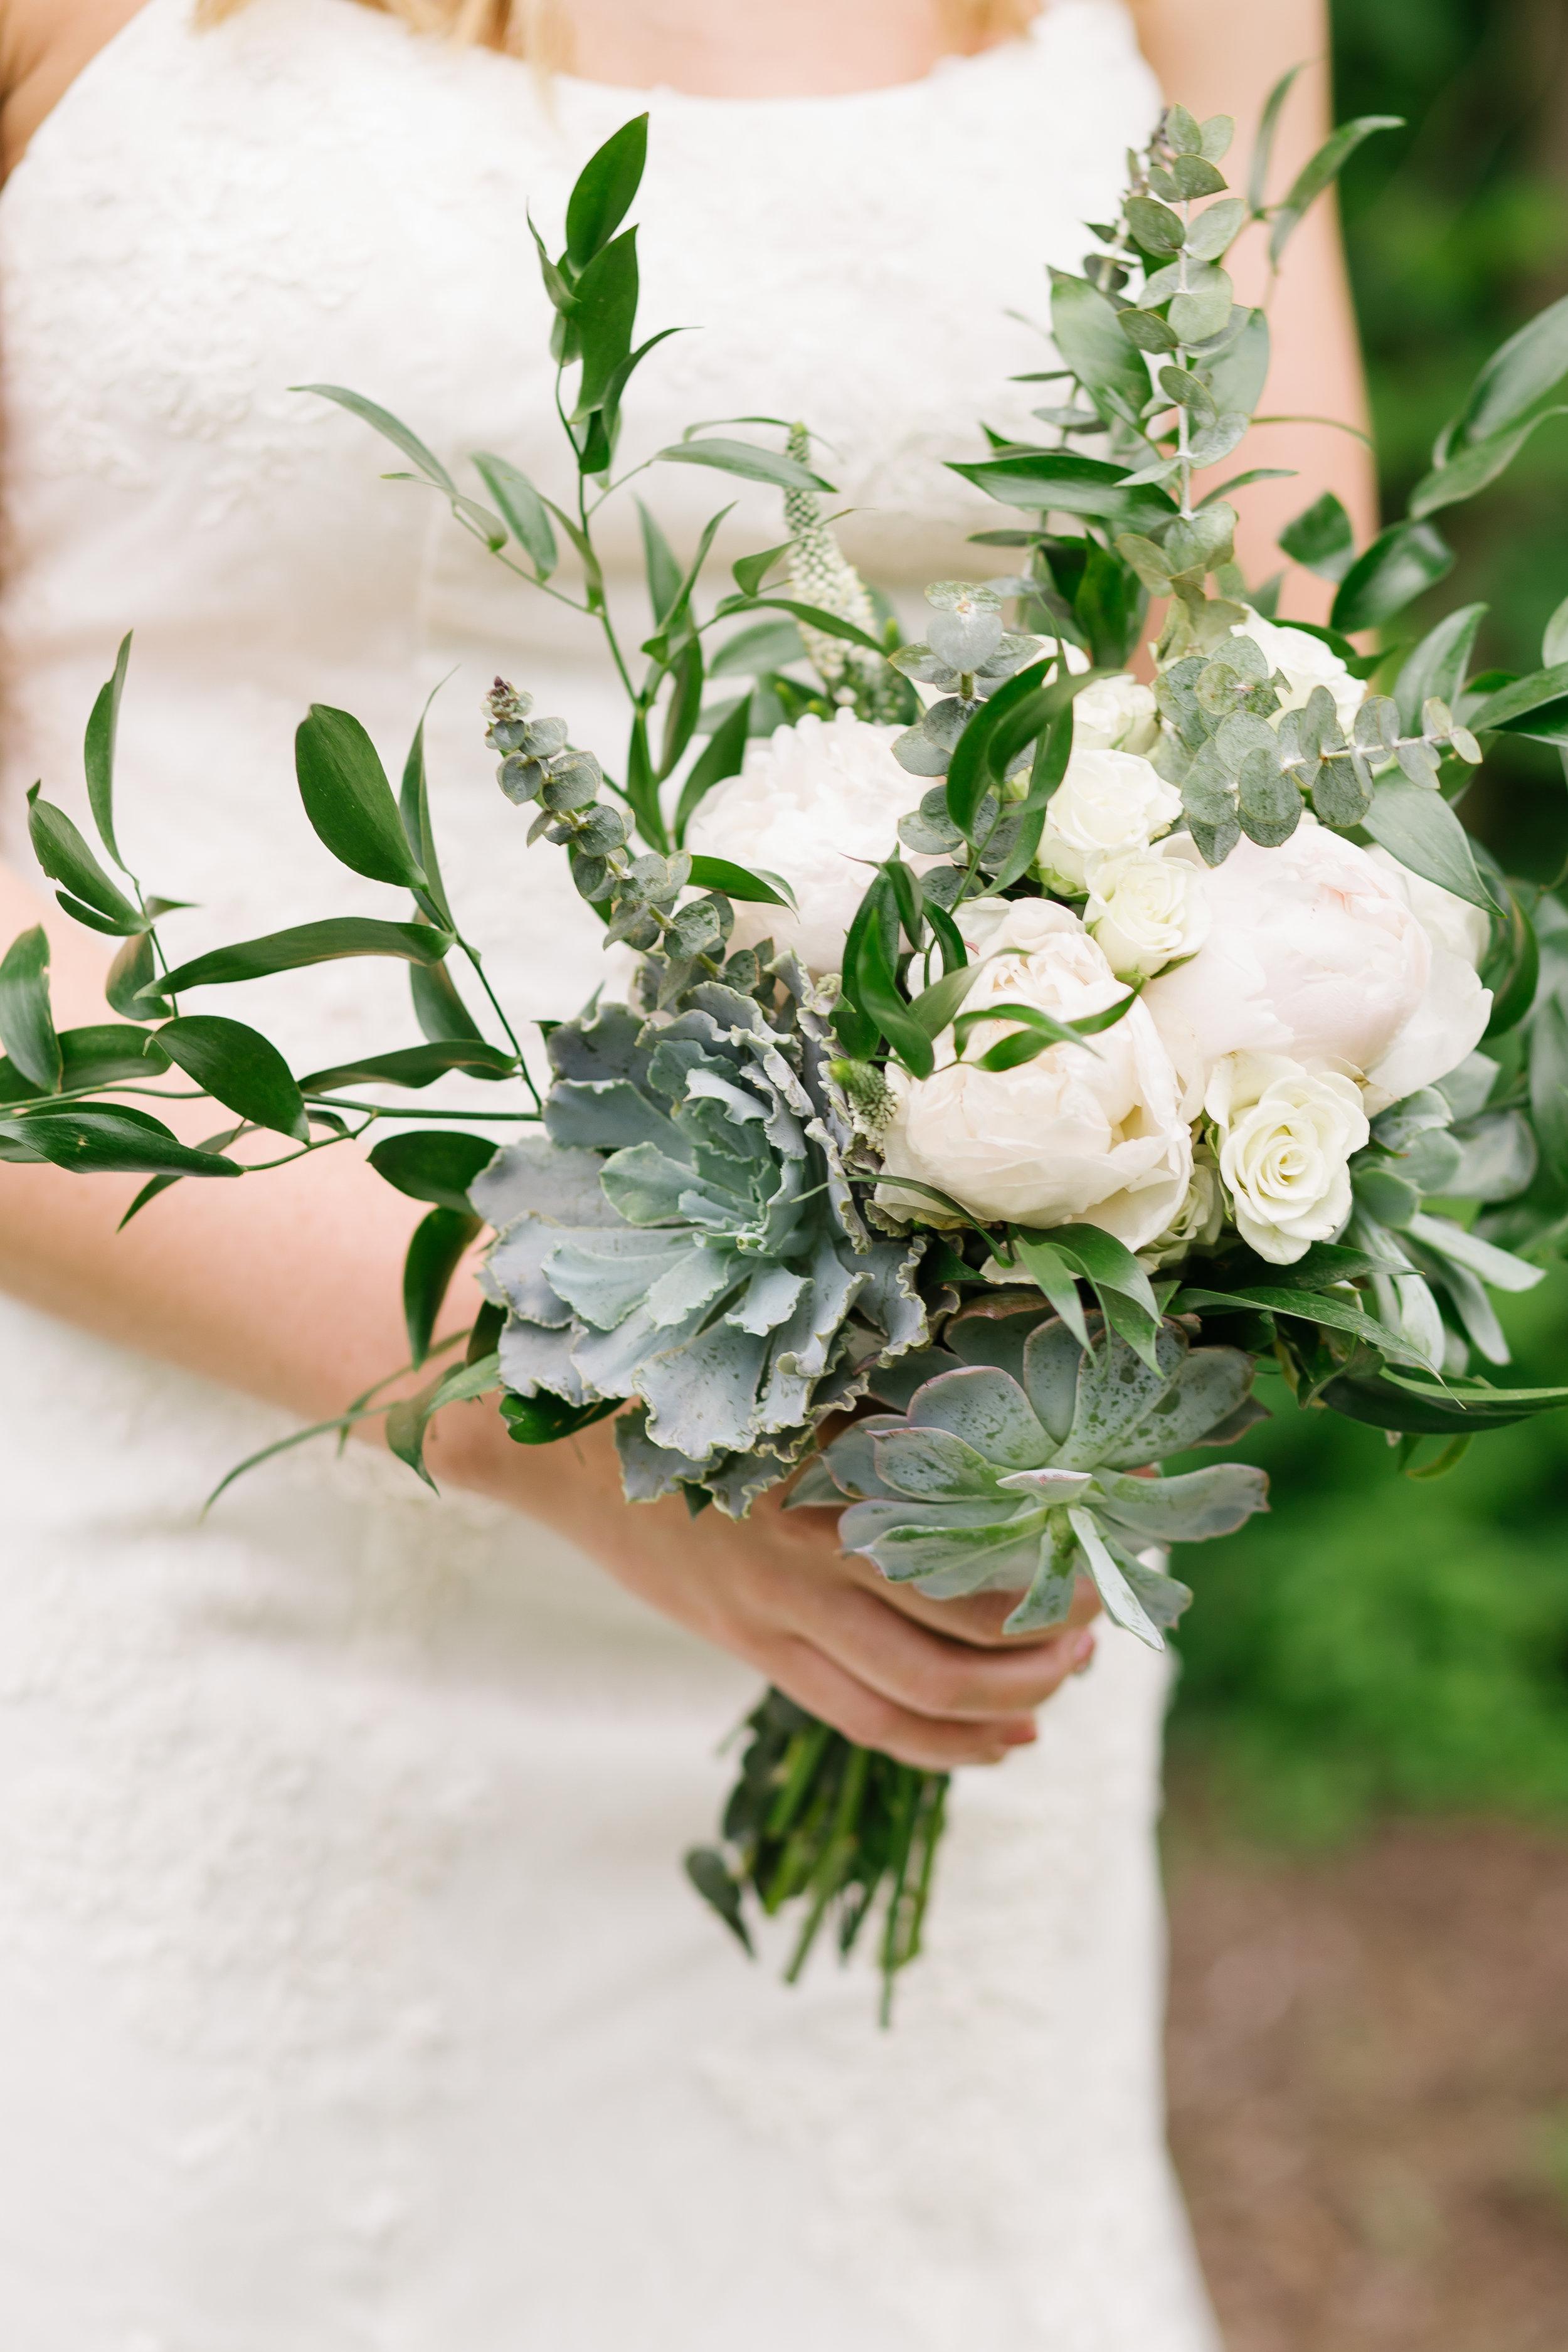 Connecticut Wedding Photographer | Lauryn Alisa Photography | www.laurynalisaphotography.com